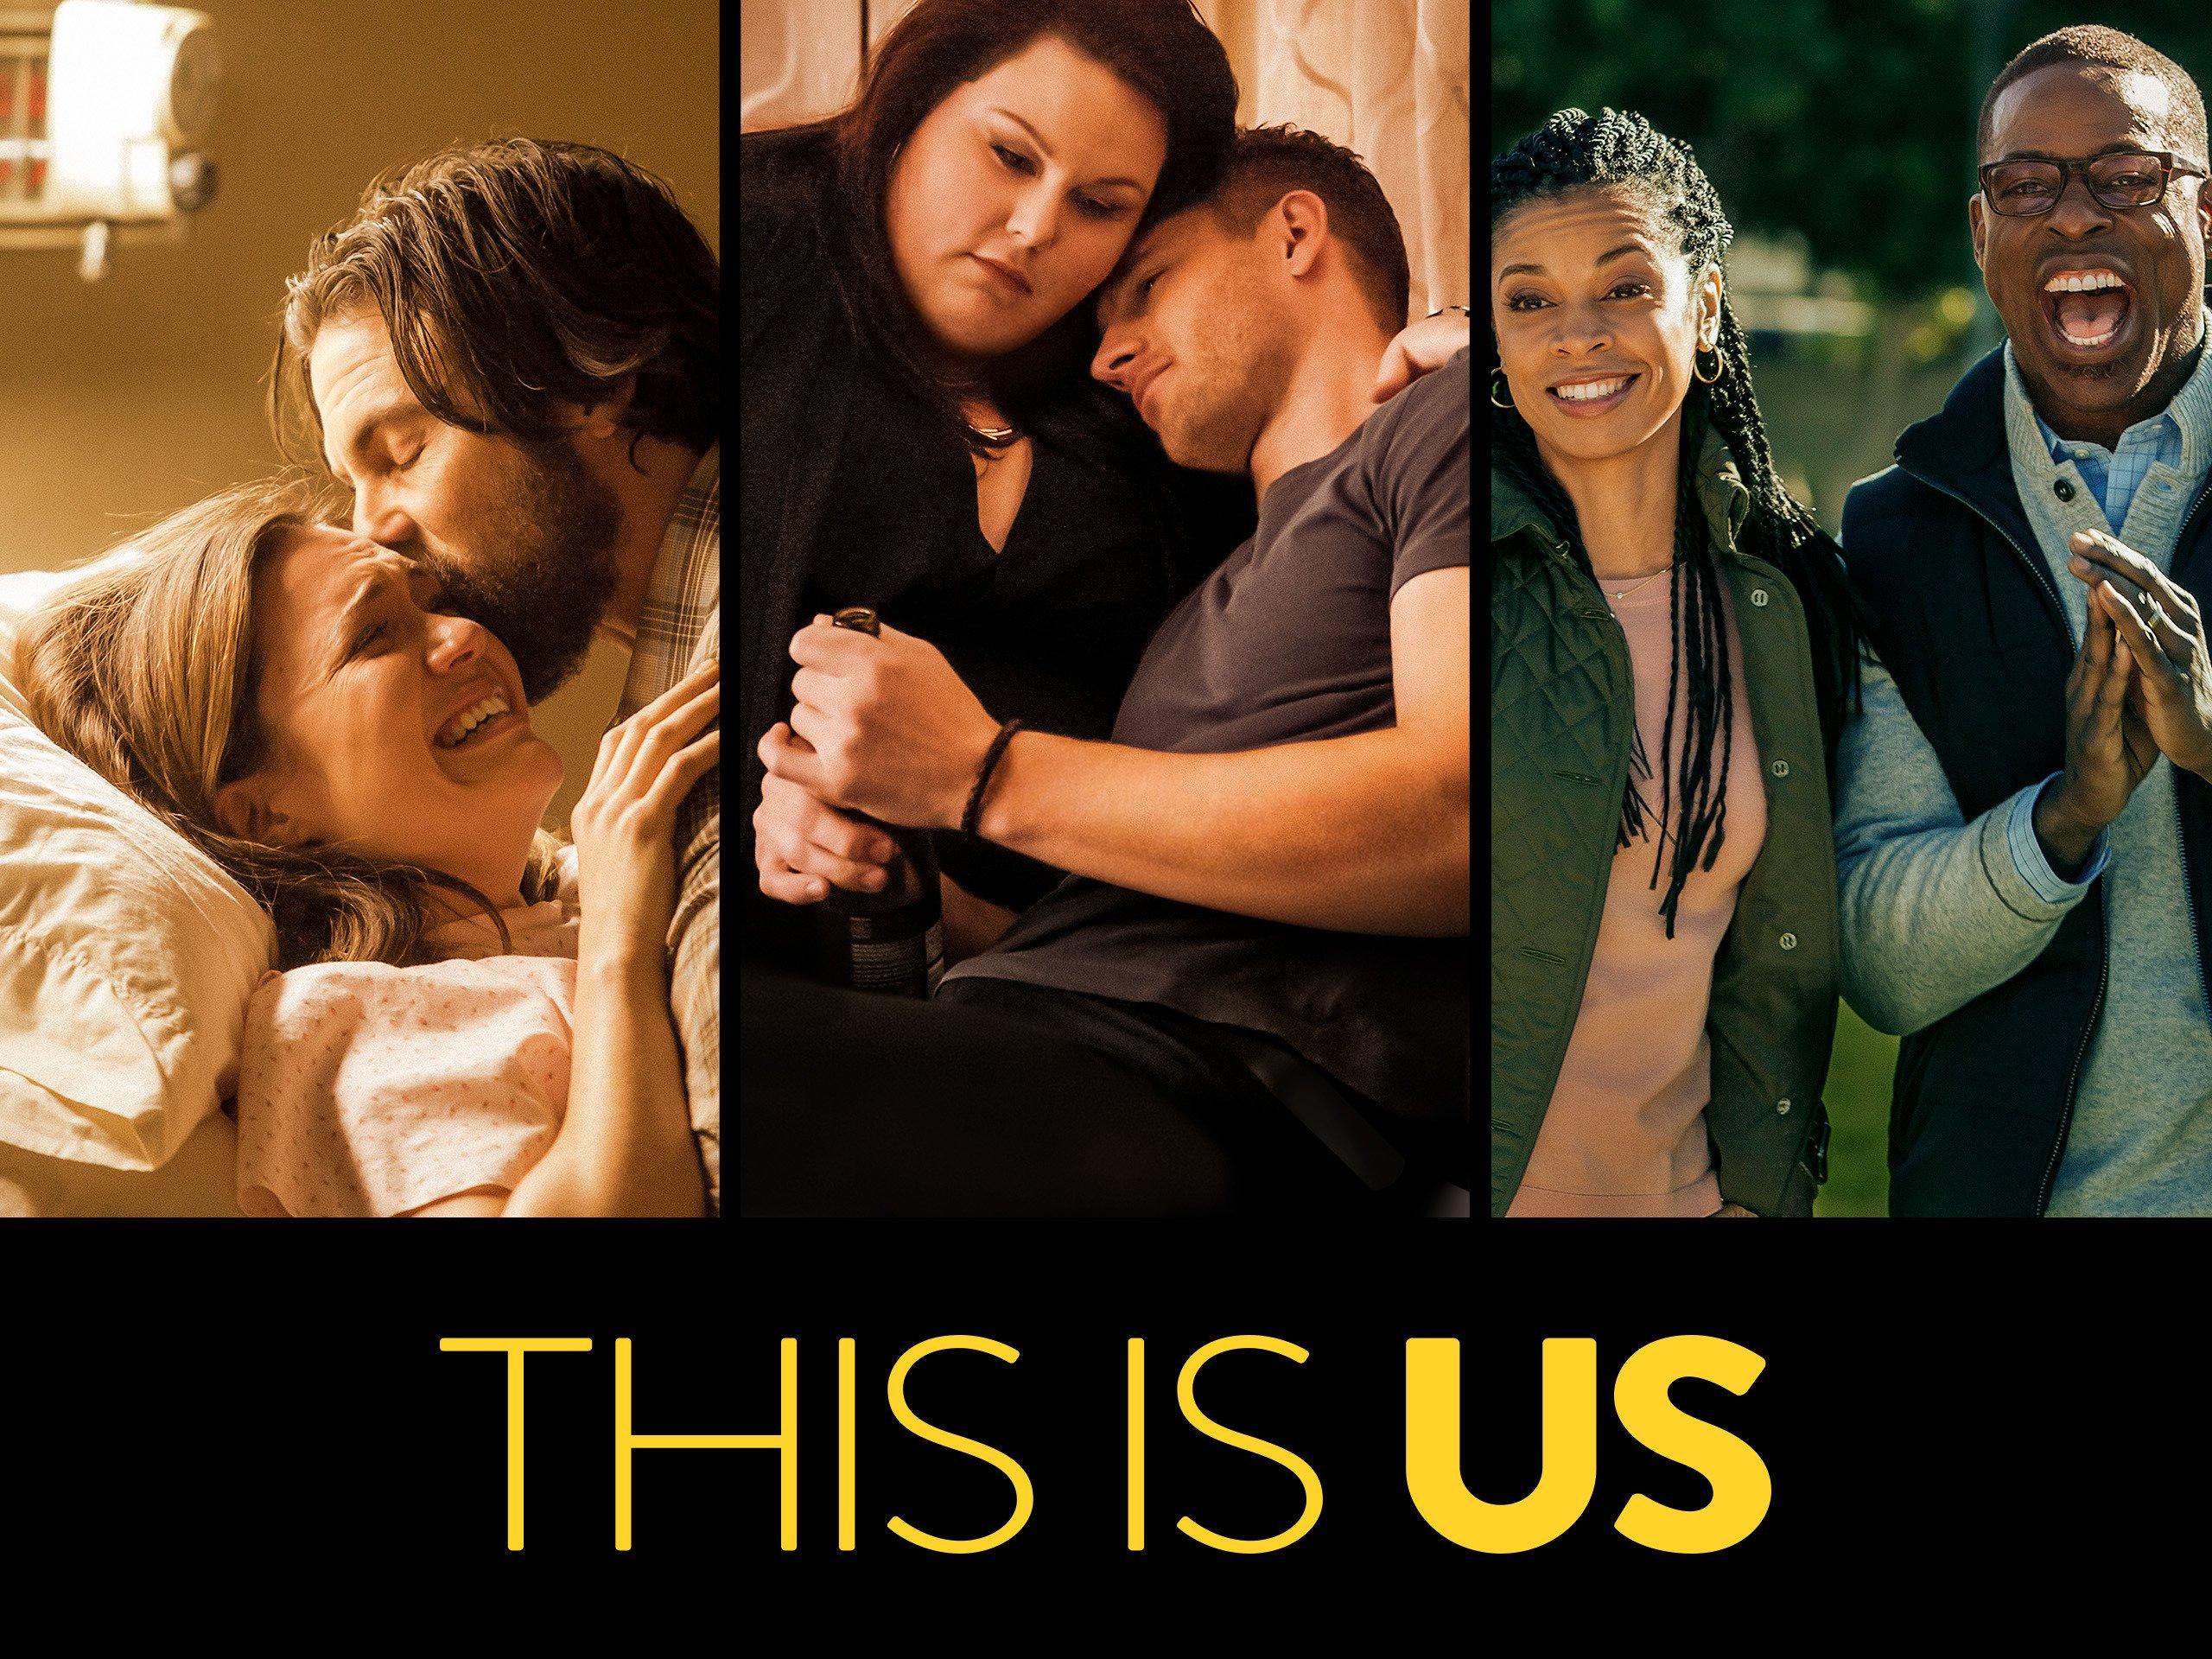 This is Us Season 1 - Season 1